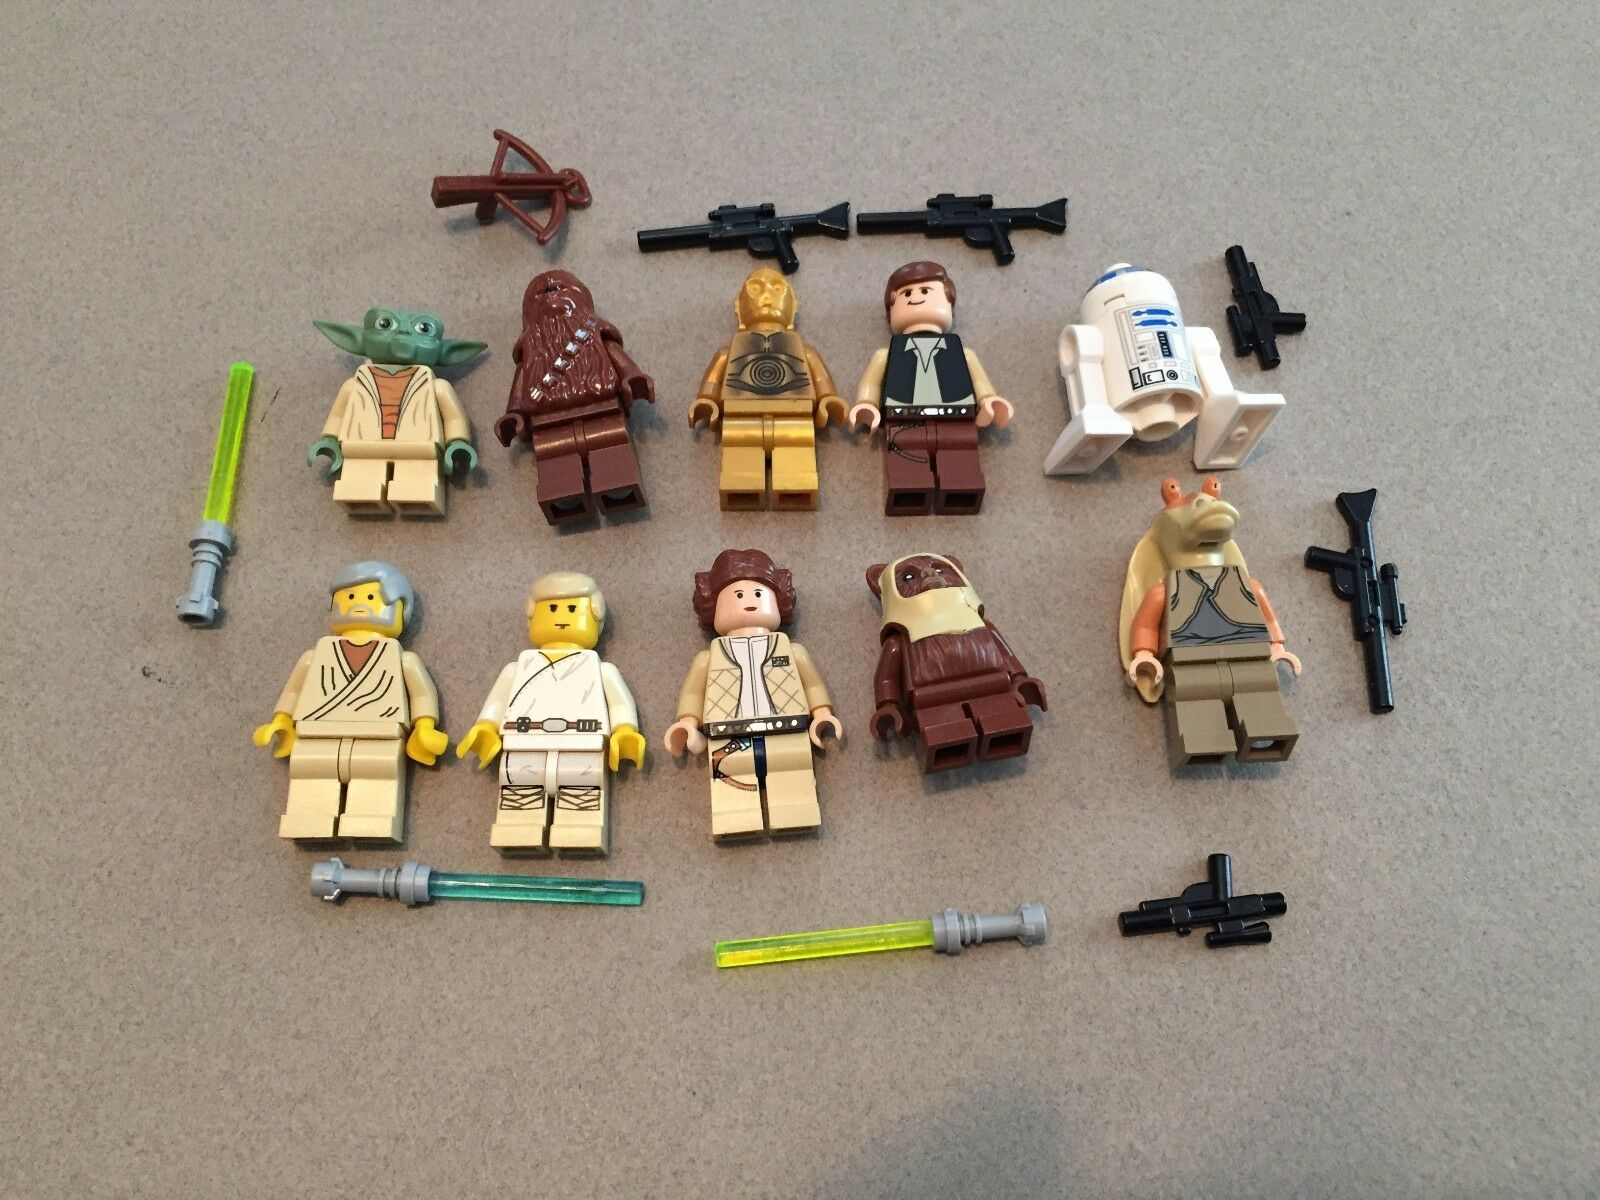 senza esitazione! acquista ora! LEGO lot of 10 Estrella Guerras Good Guy Minifigs Yoda Yoda Yoda Luke Leia Han R2-D2 Chewie K306  economico e alla moda